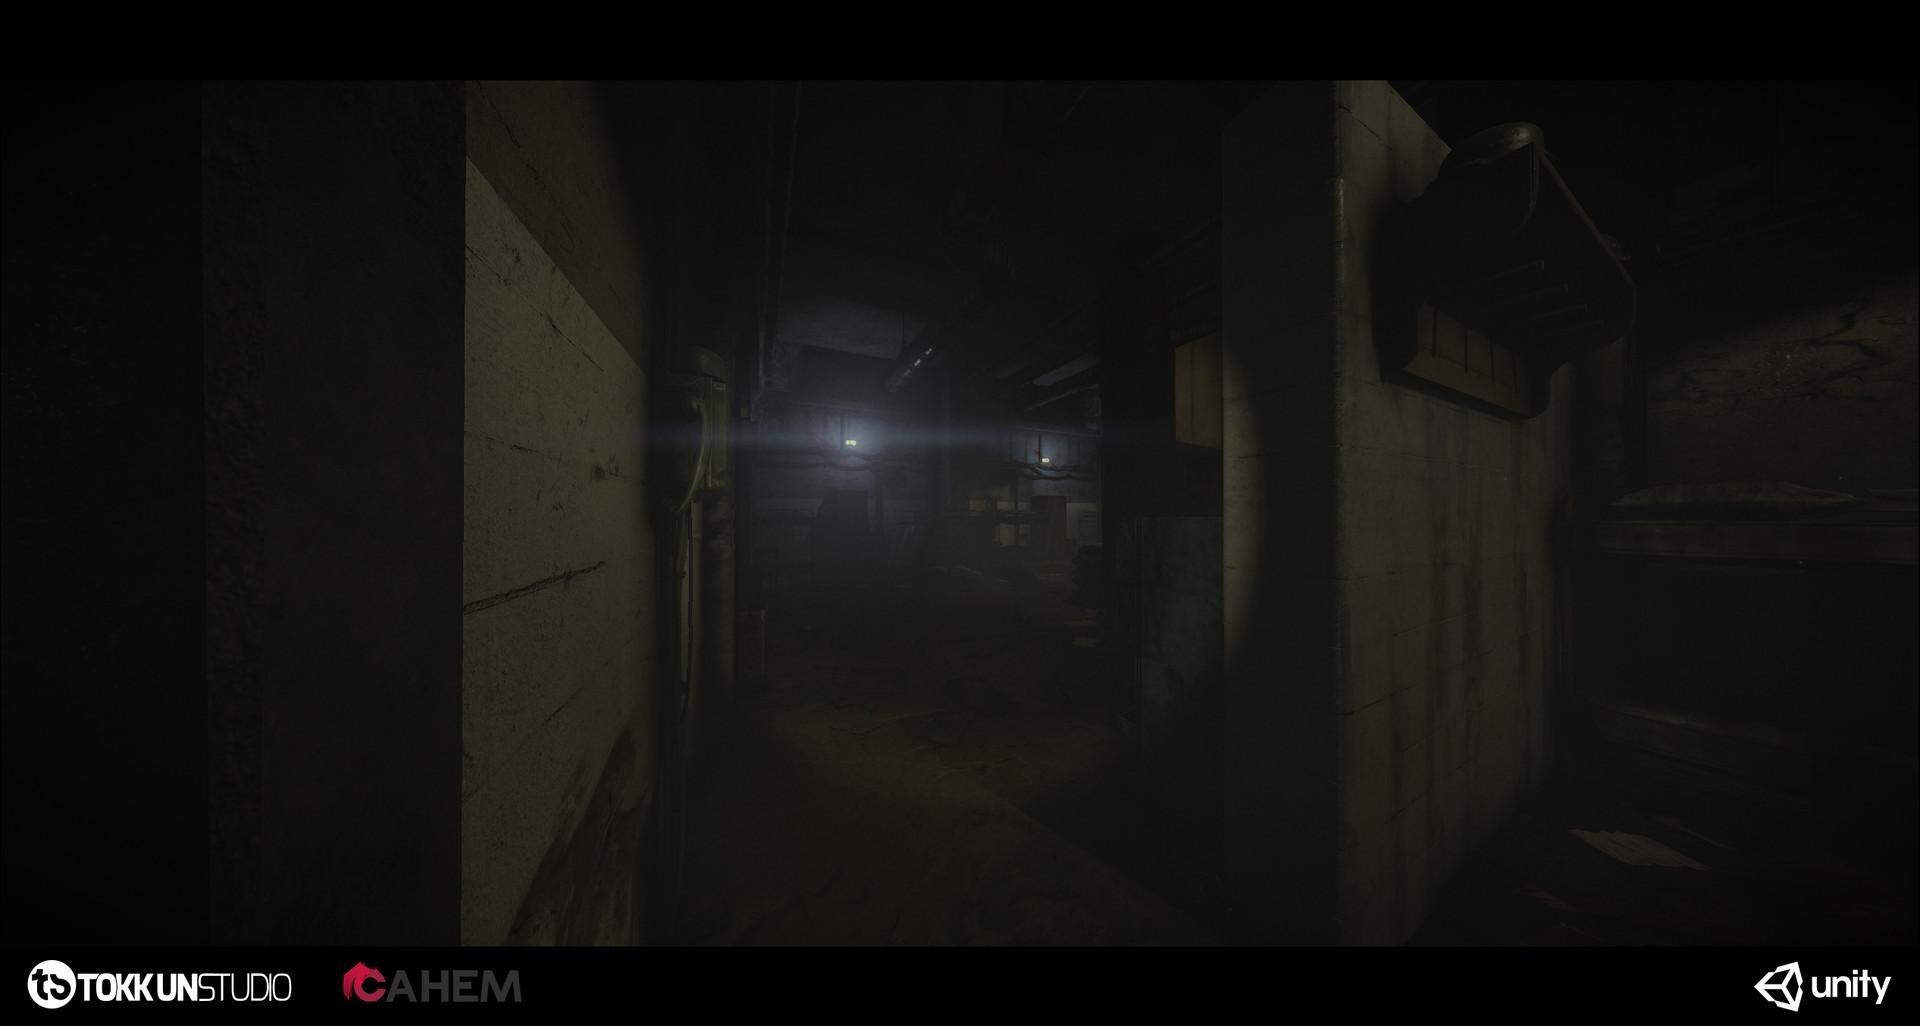 Tokkun studio bunker shot 09